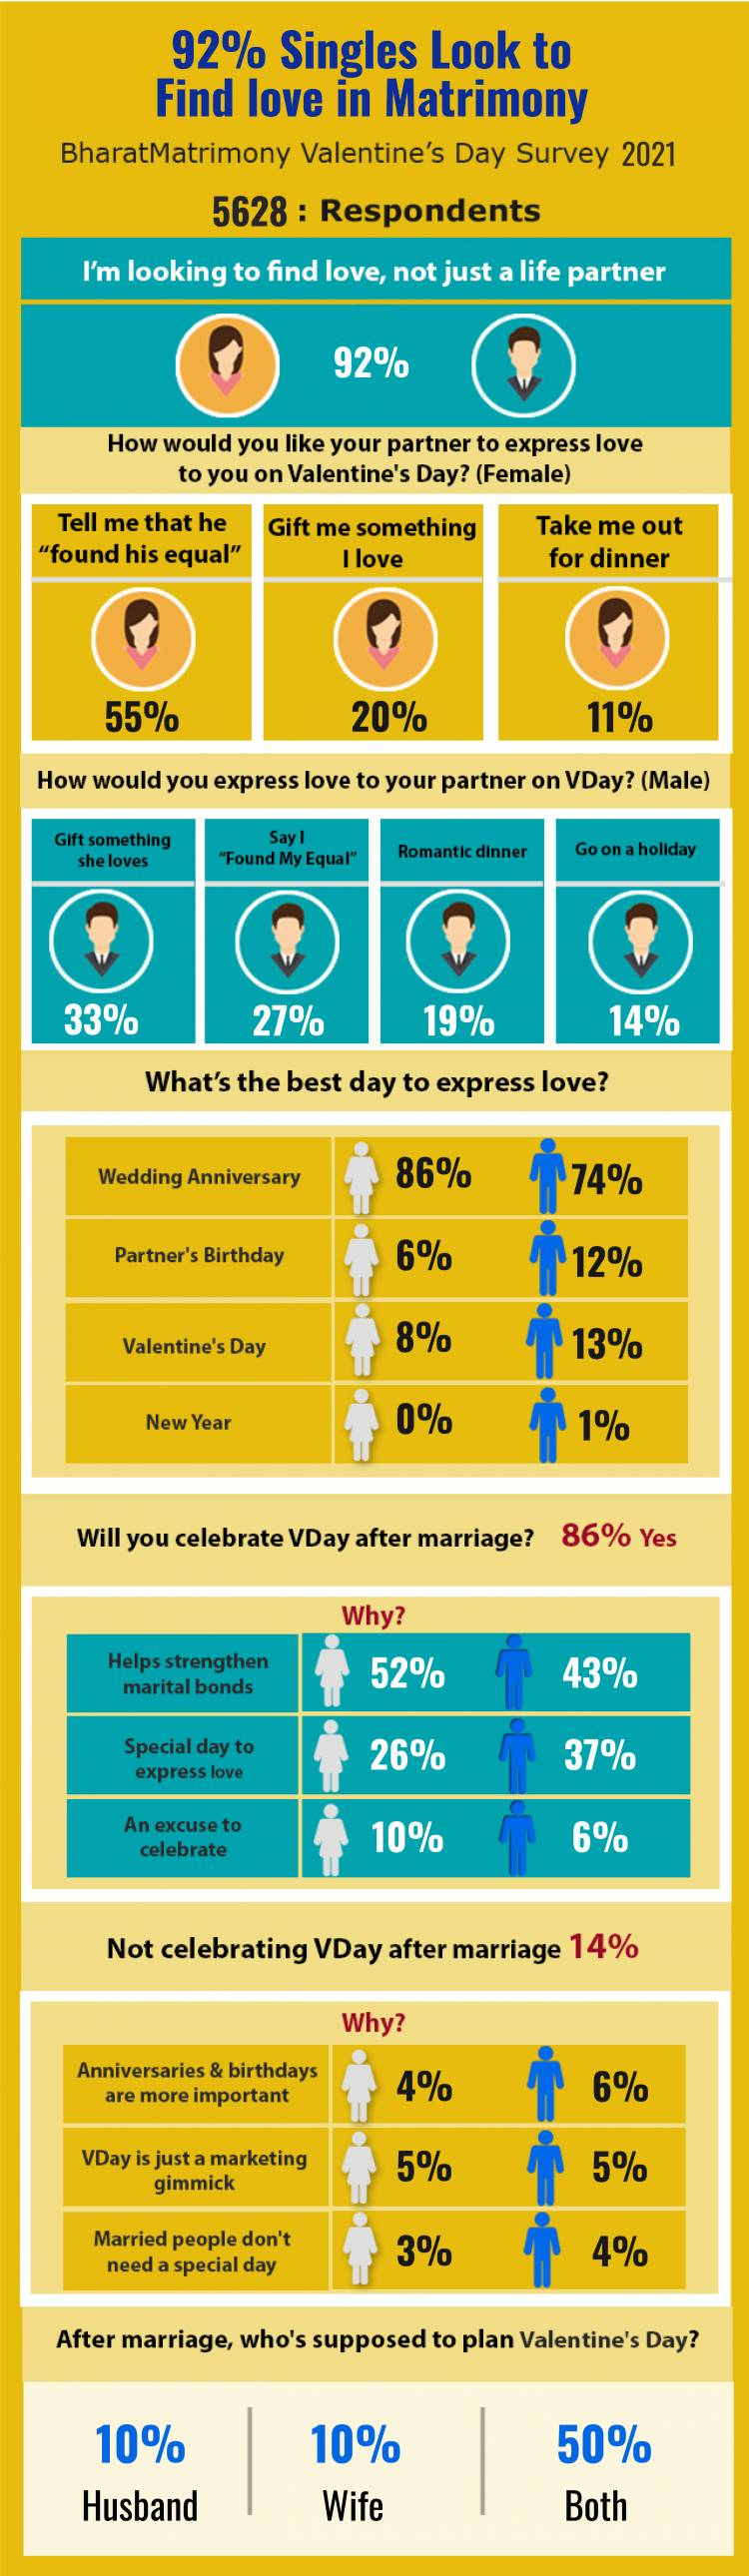 92% INDIAN SINGLES LOOK FOR LOVE IN MATRIMONY: BHARATMATRIMONY VALENTINE'S DAY SURVEY